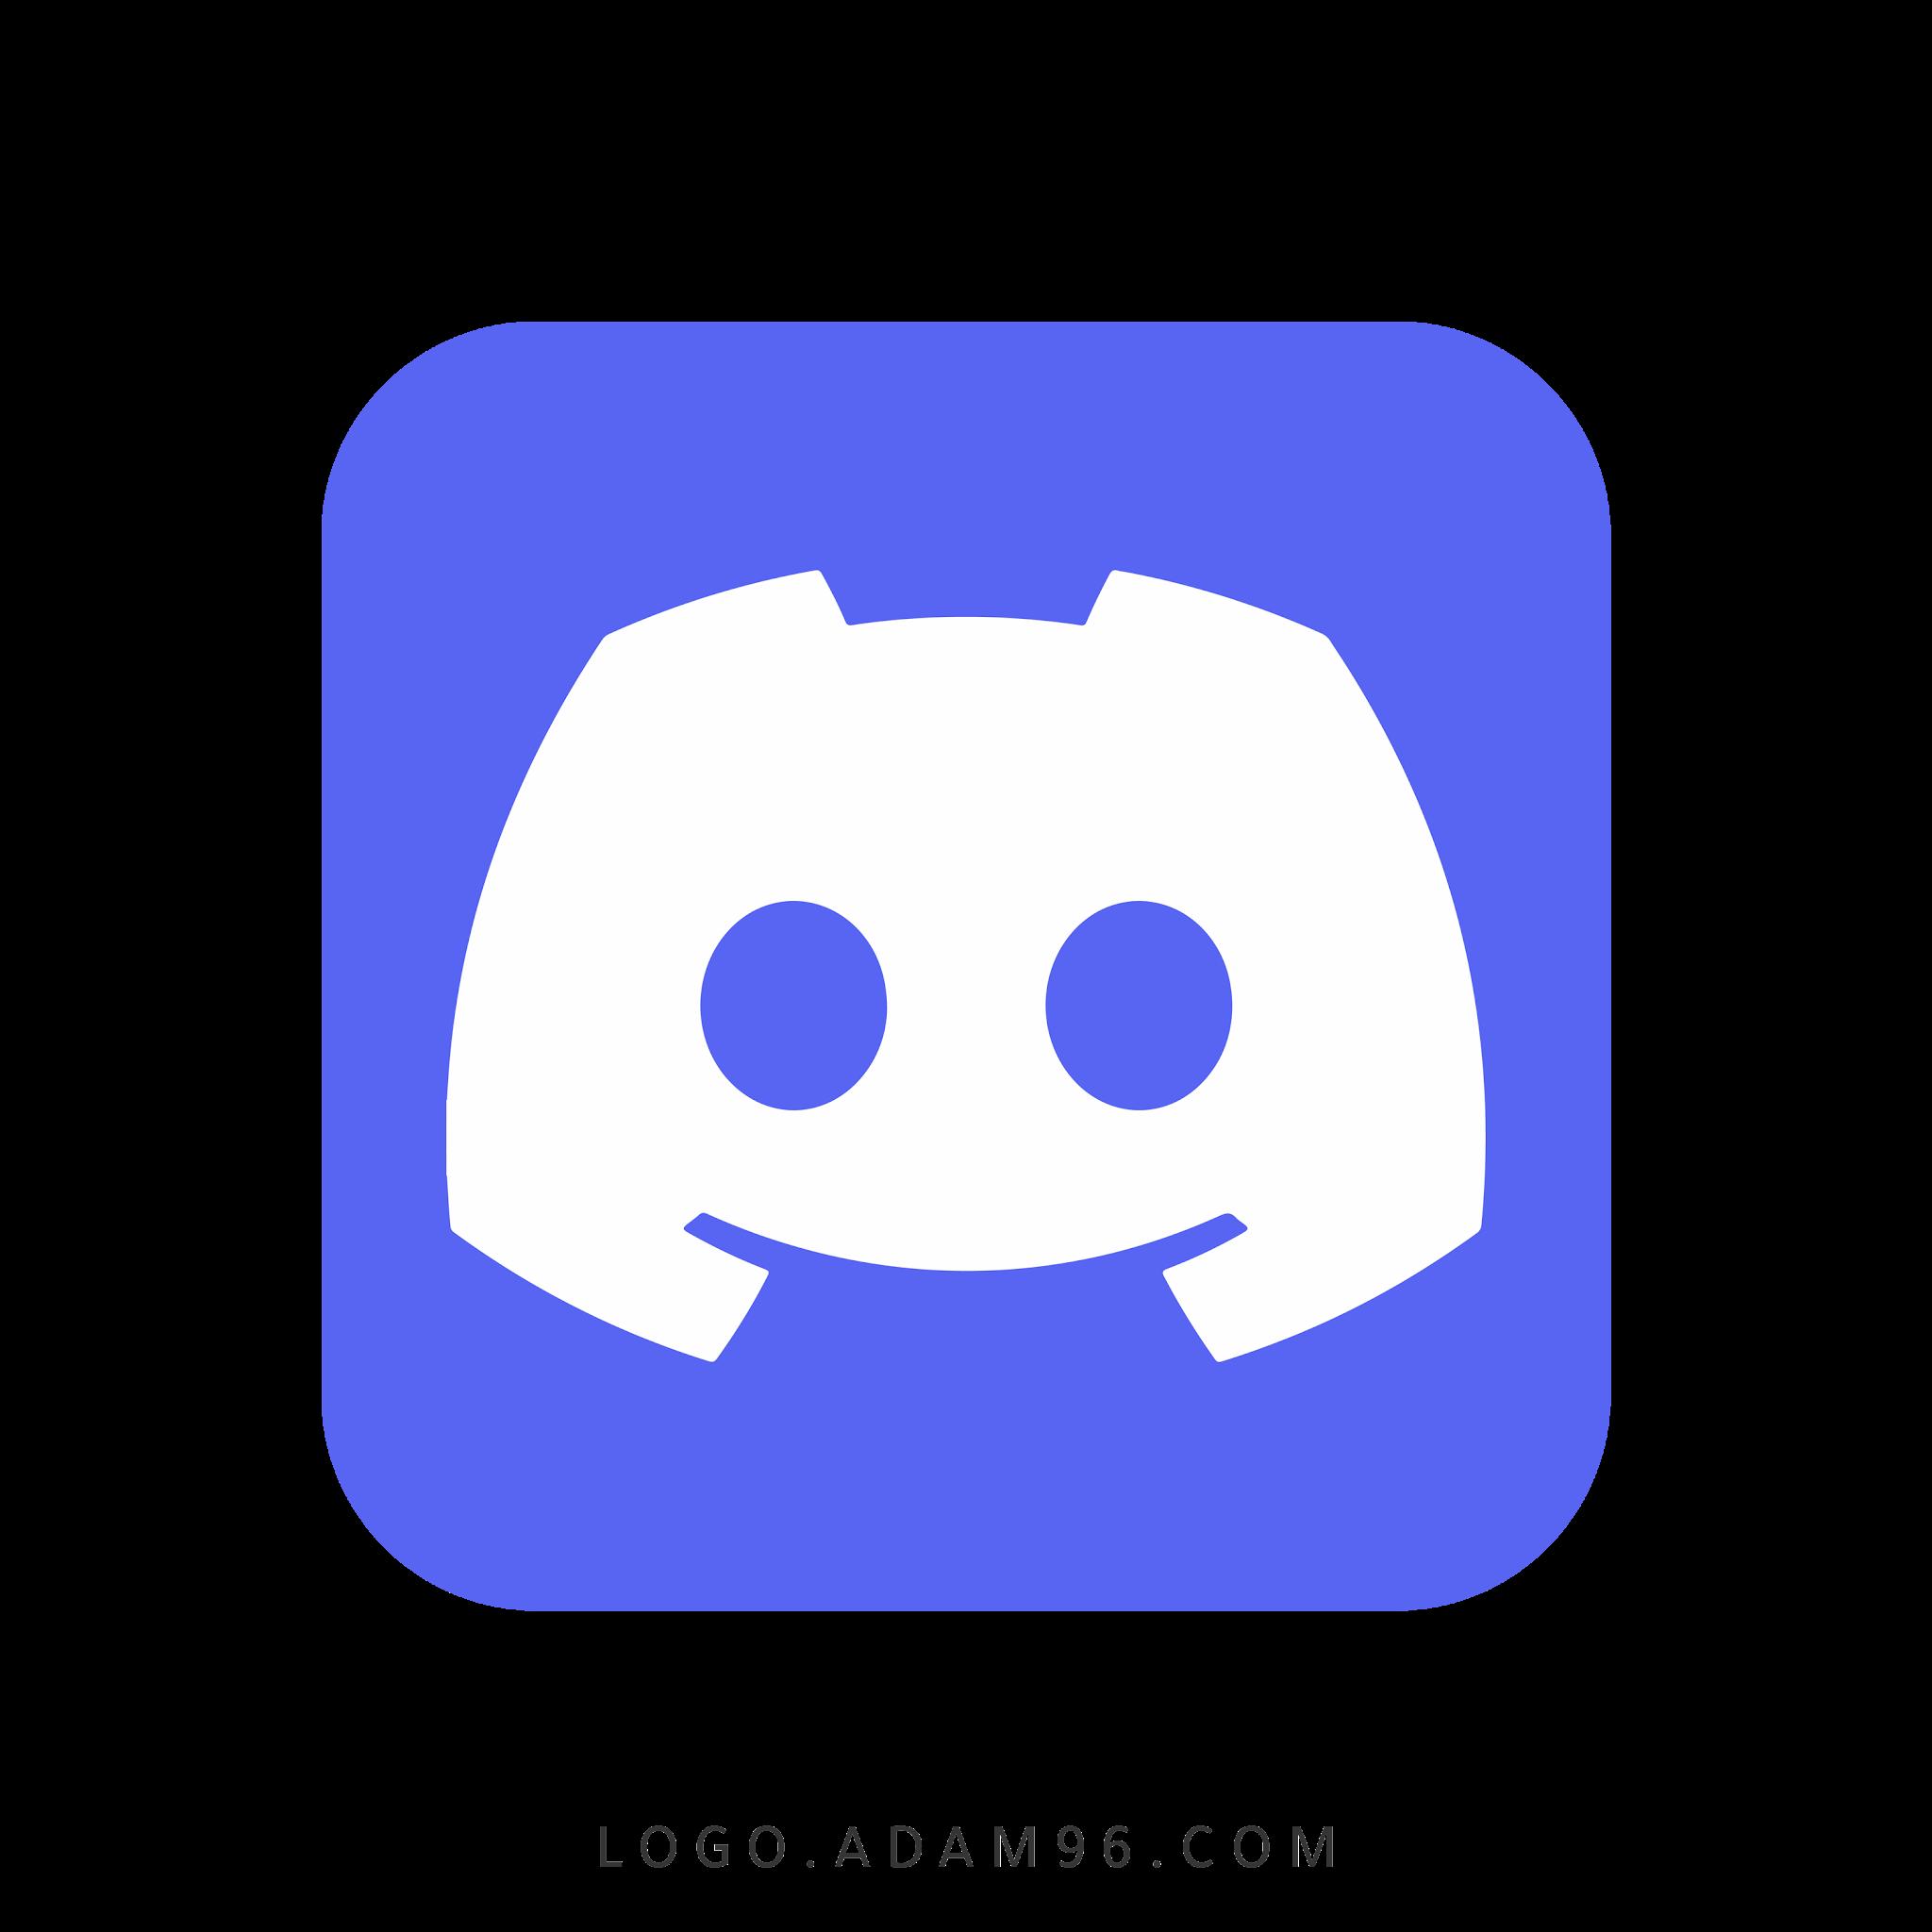 تحميل شعار برنامج ديسكورد | Logo Discord PNG